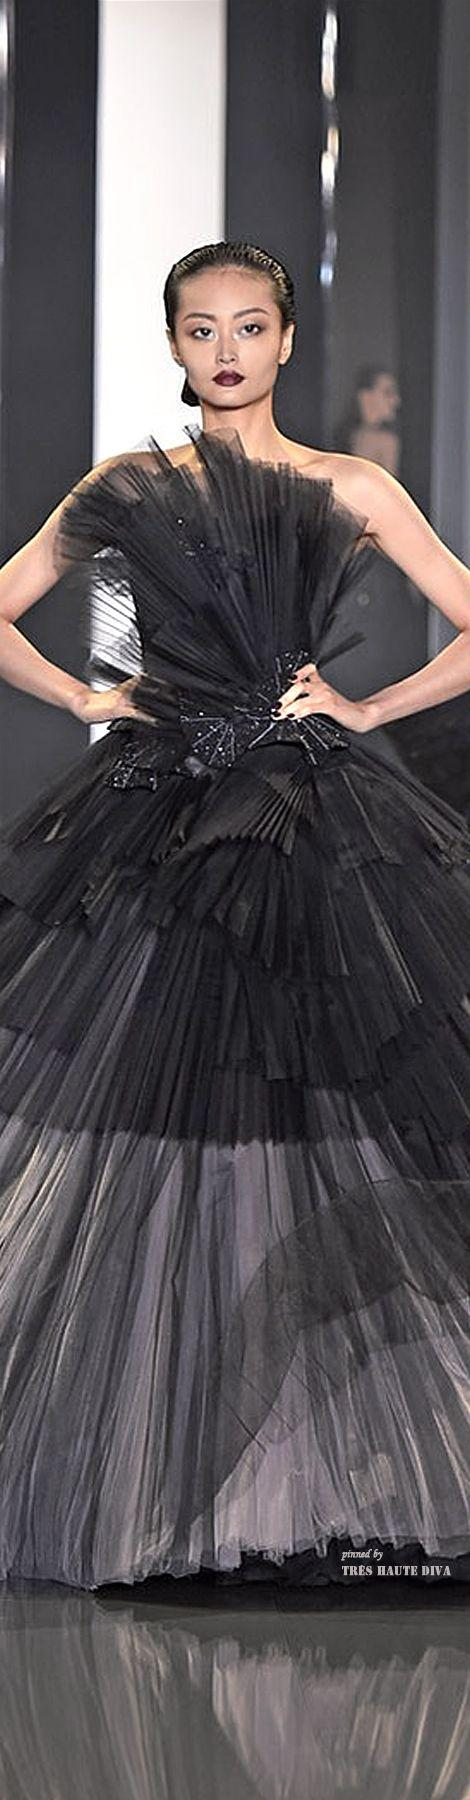 زفاف - Gowns........Black Beauties